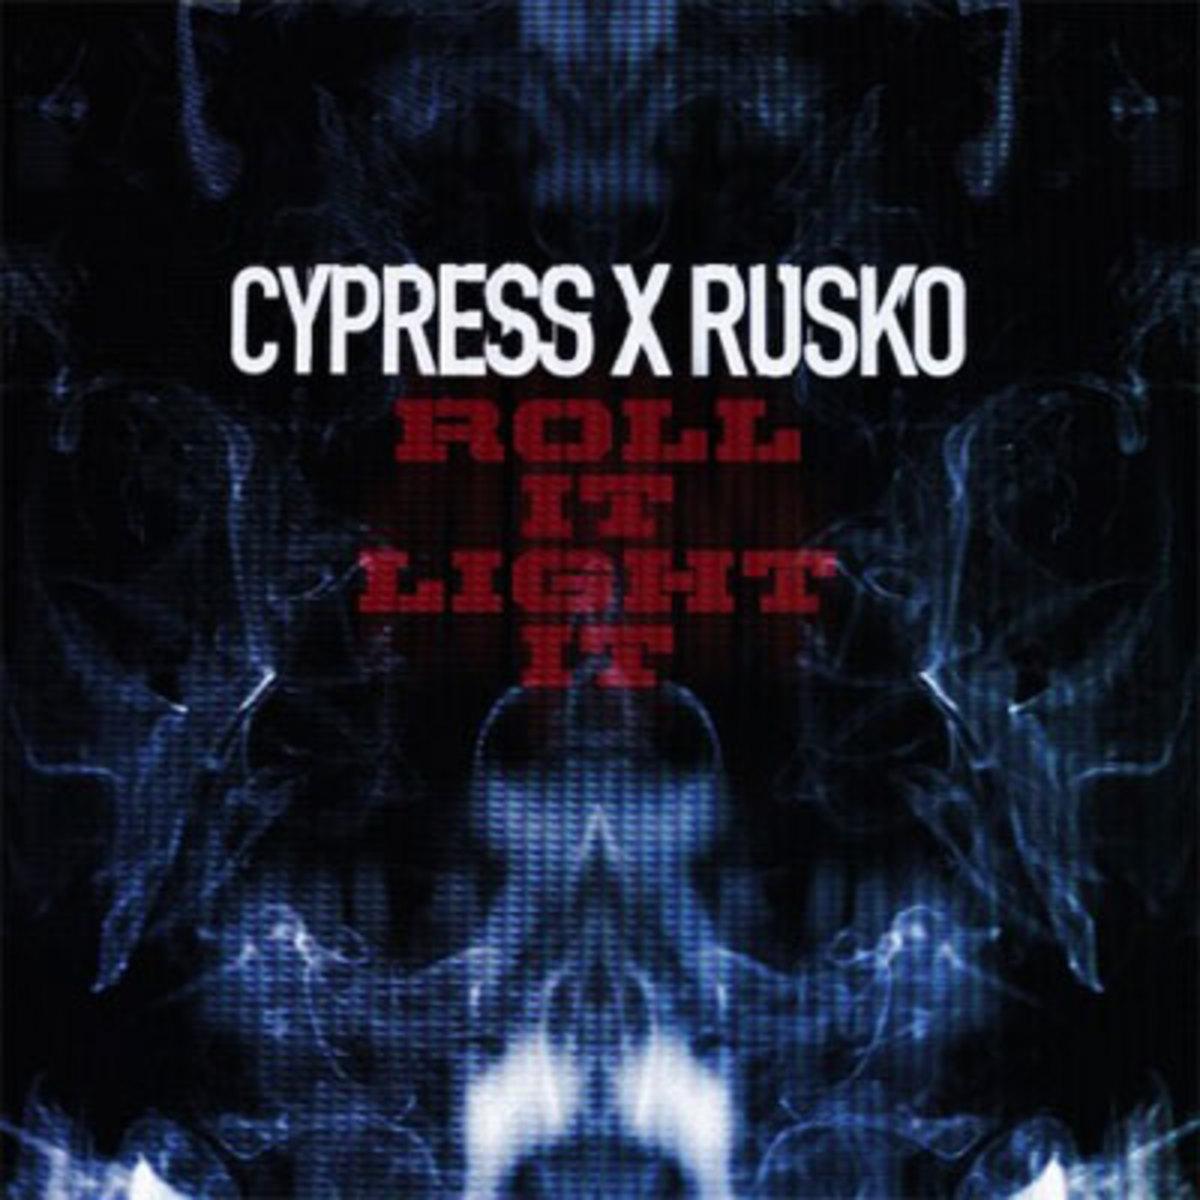 cypress-rollitlightit.jpg